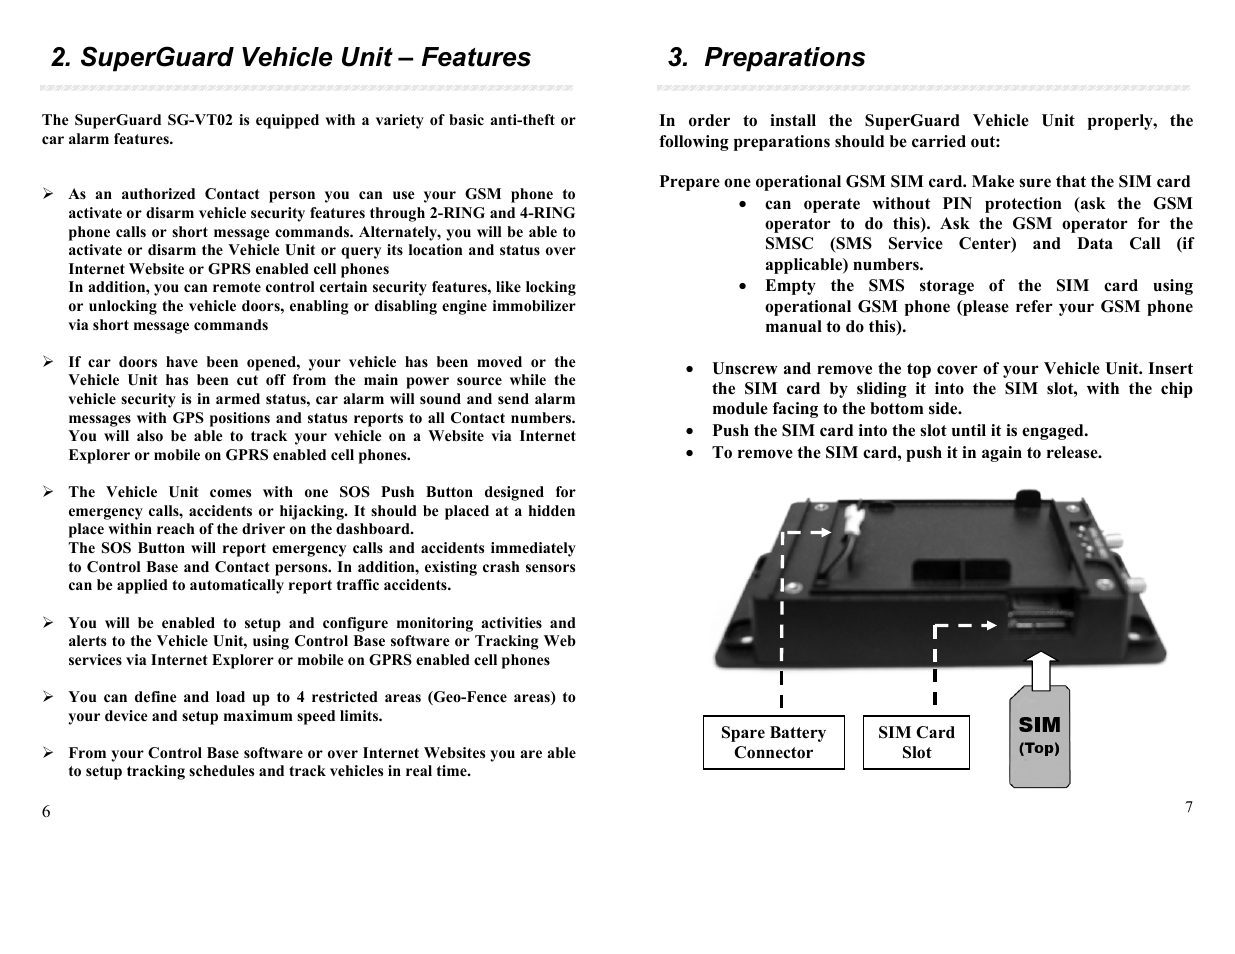 superguard vehicle unit features preparations apm sg vt02 qb rh manualsdir com apm user manual apm user manual